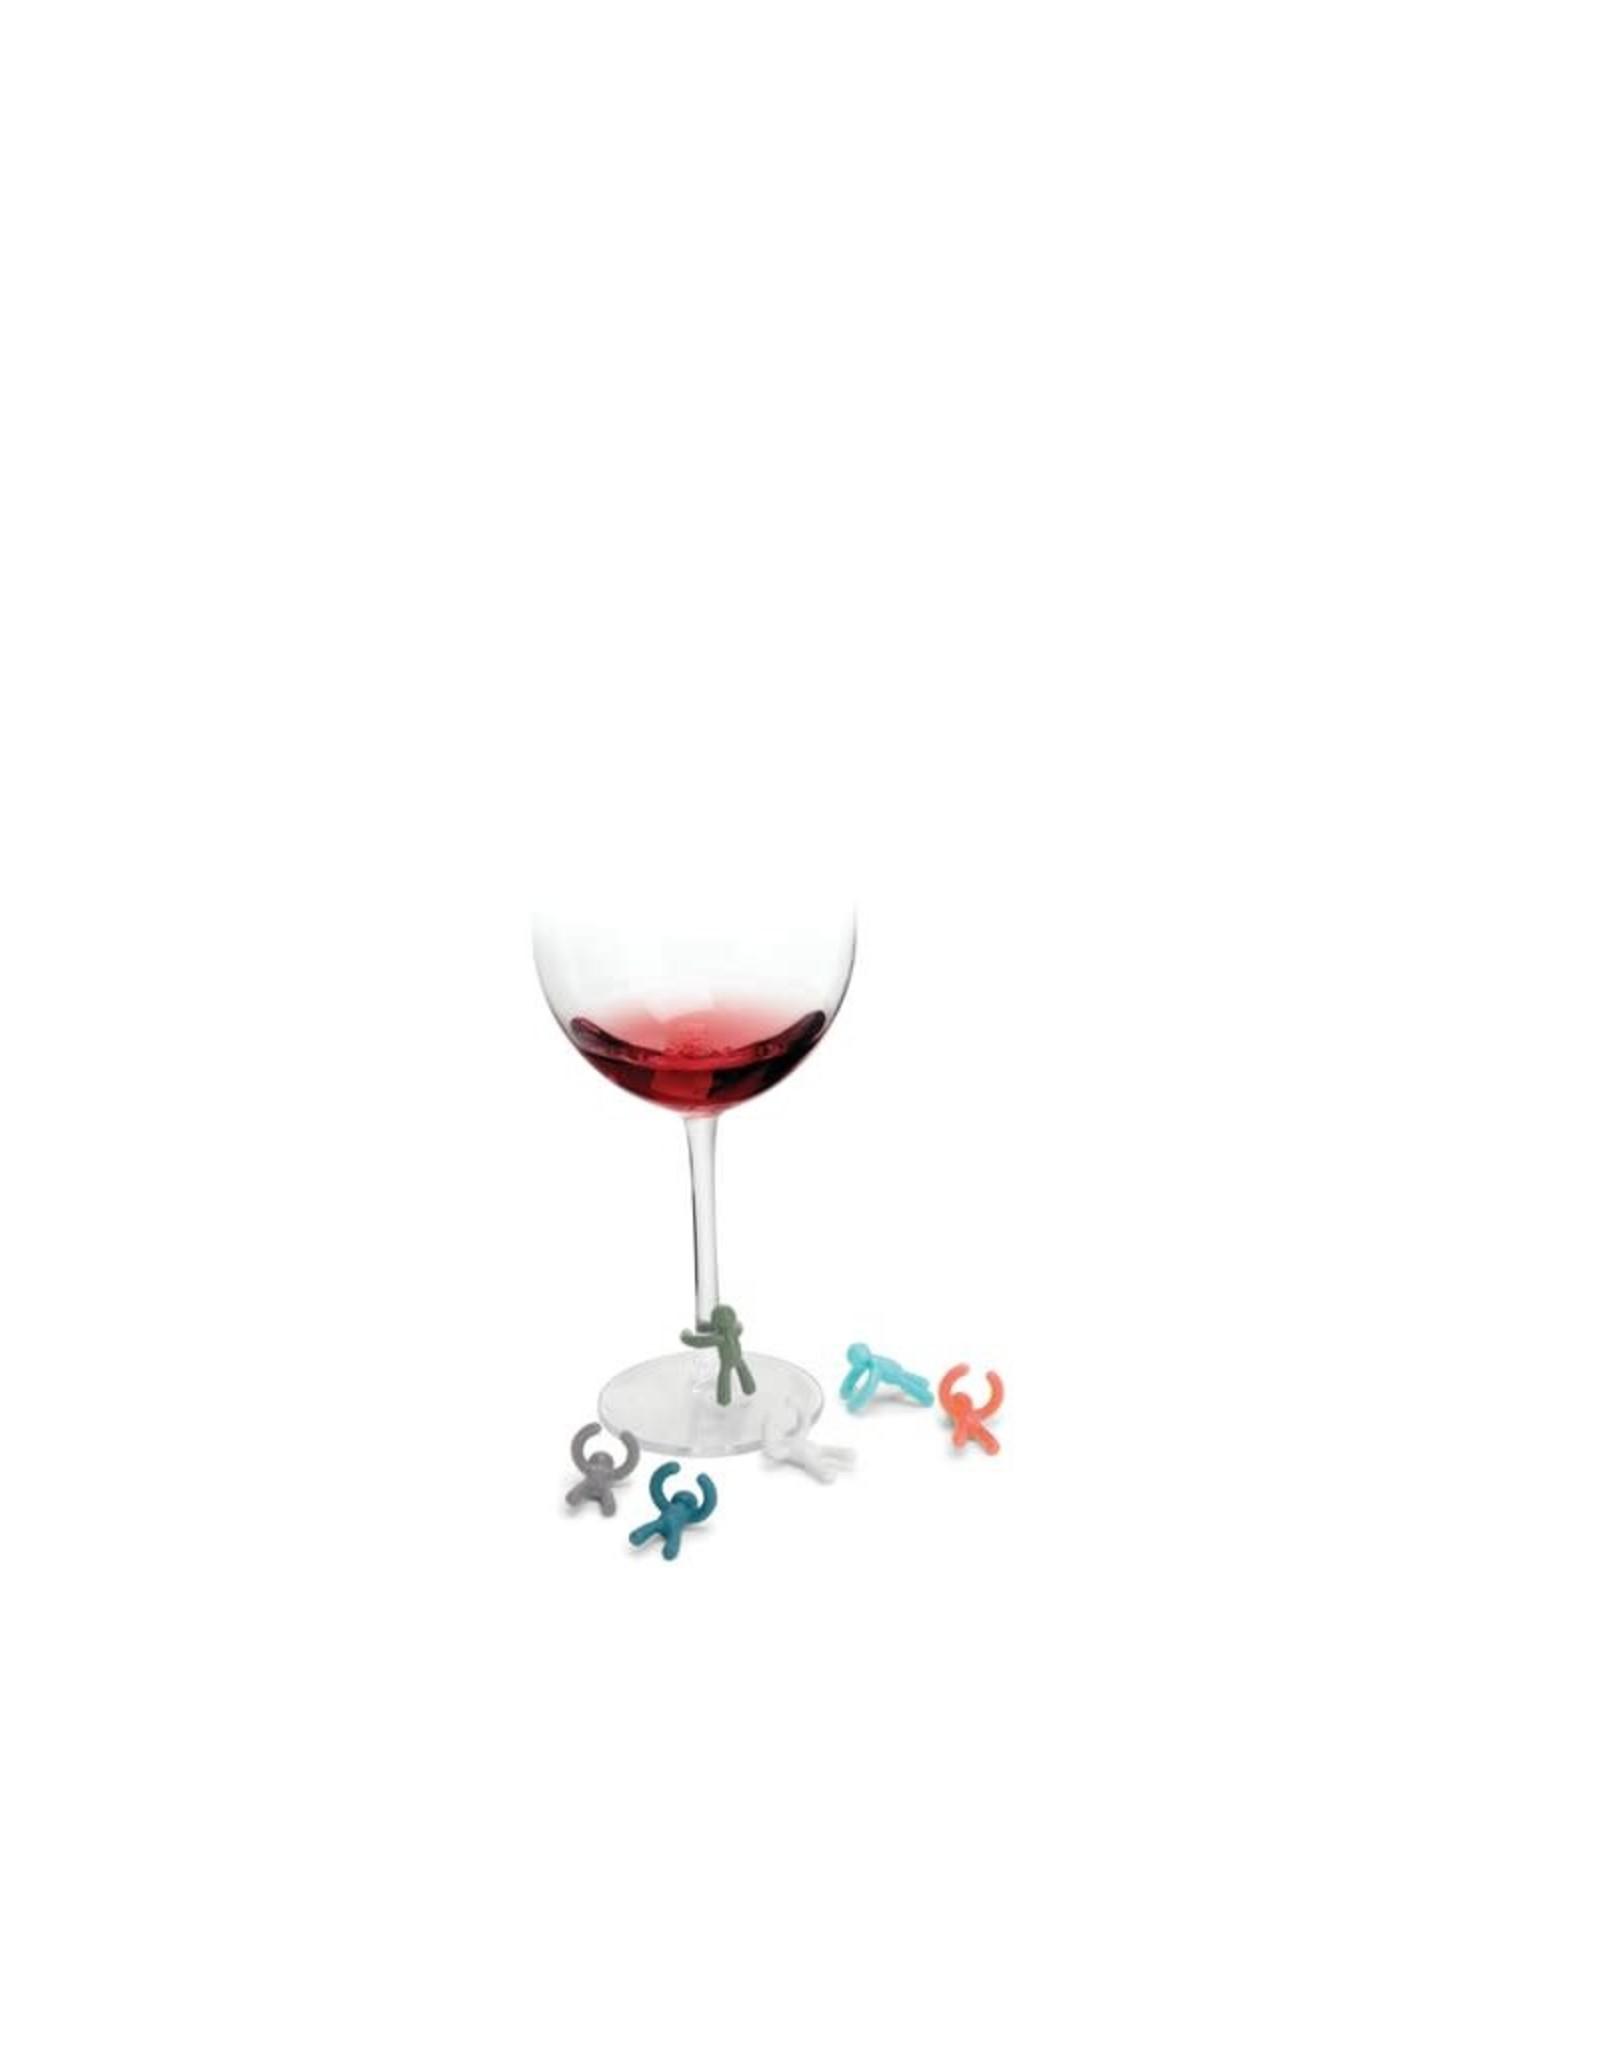 Umbra drinking charm - buddy (7)